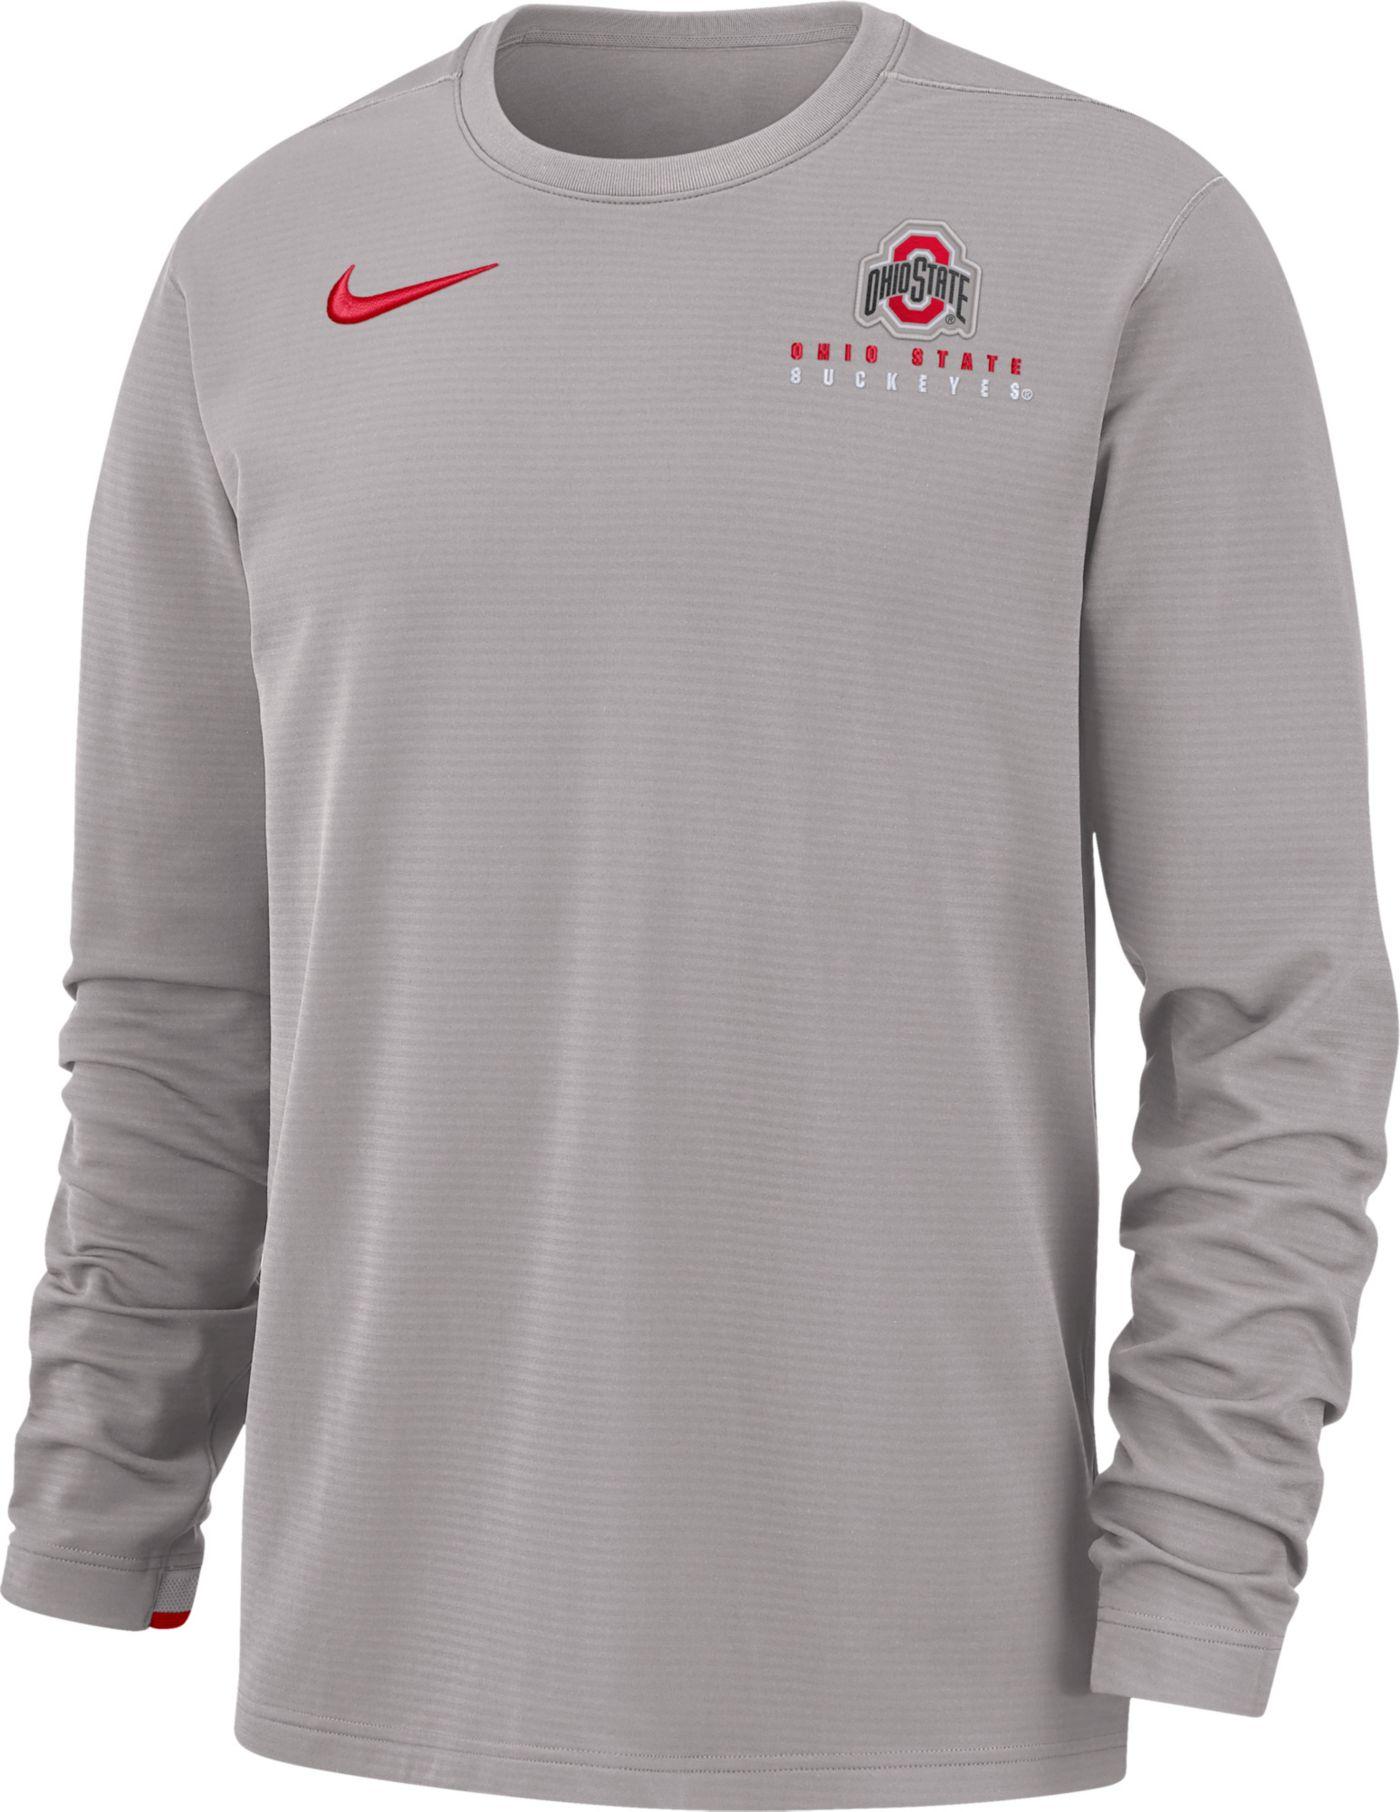 Nike Men's Ohio State Buckeyes Grey Dri-FIT Modern Long Sleeve Crew Neck T-Shirt